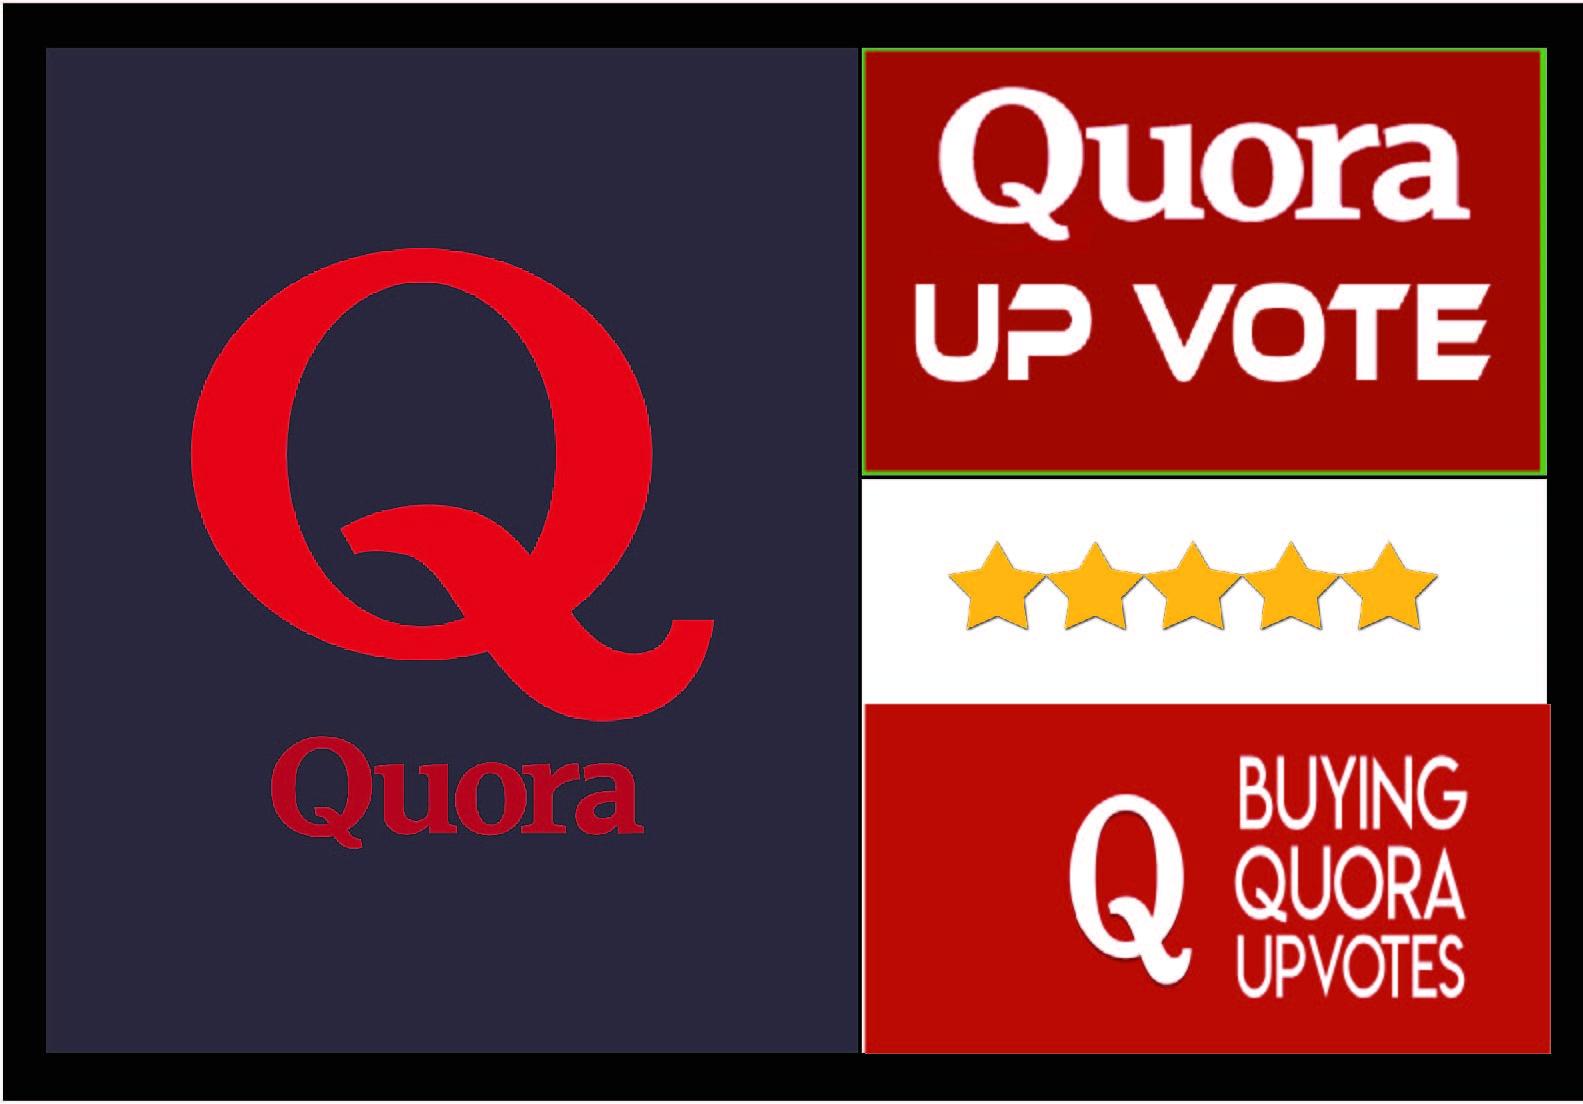 Buy 20+ quora up-votes usa, uk worldwide.